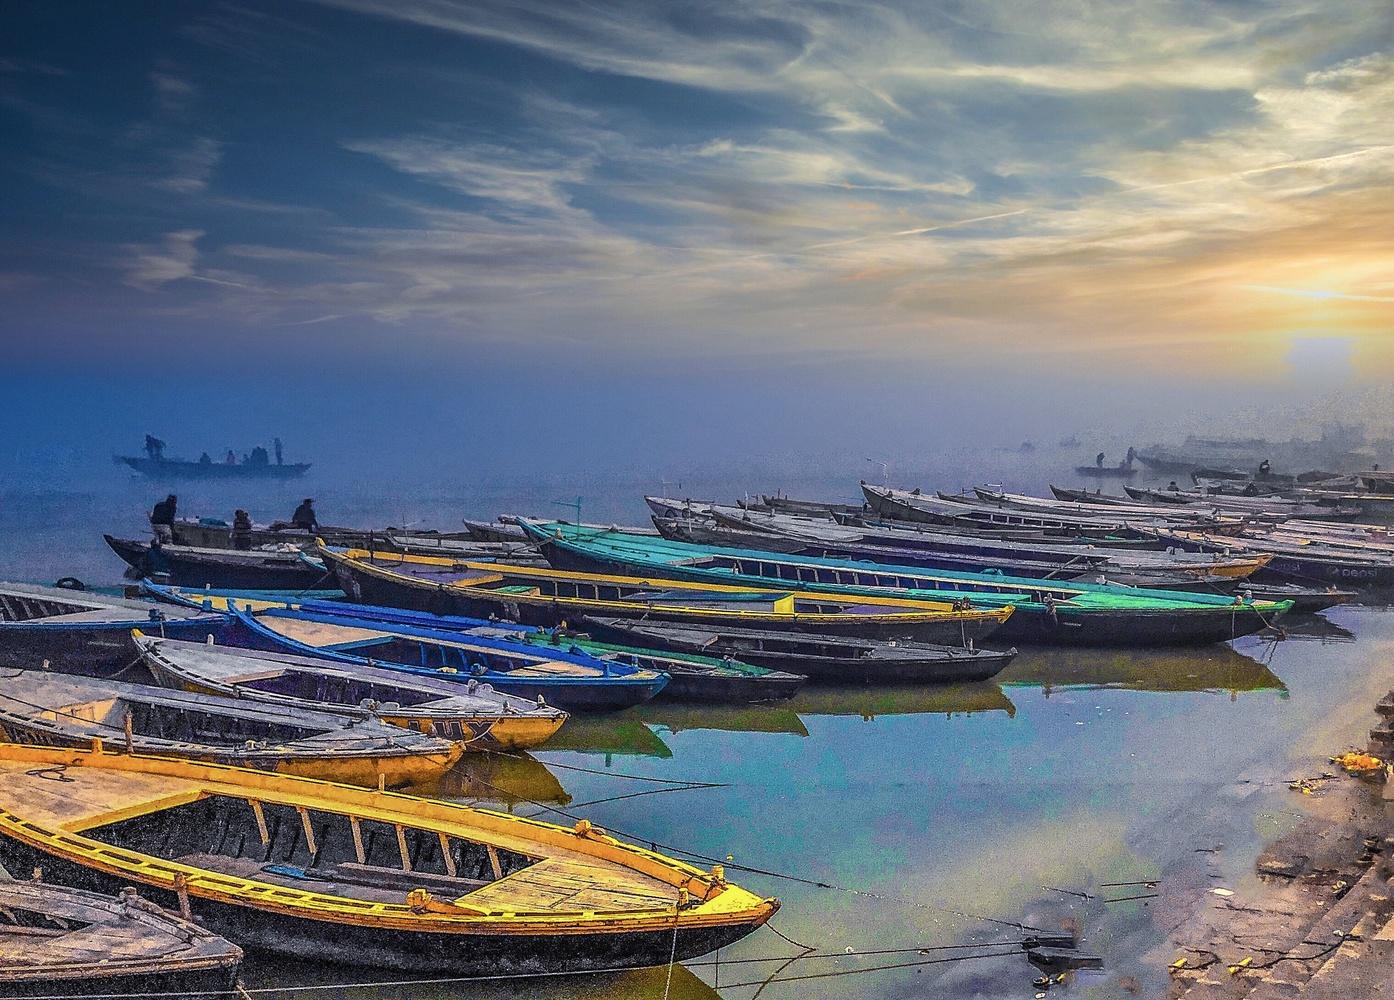 Varanasi by Anoop KULKARNI